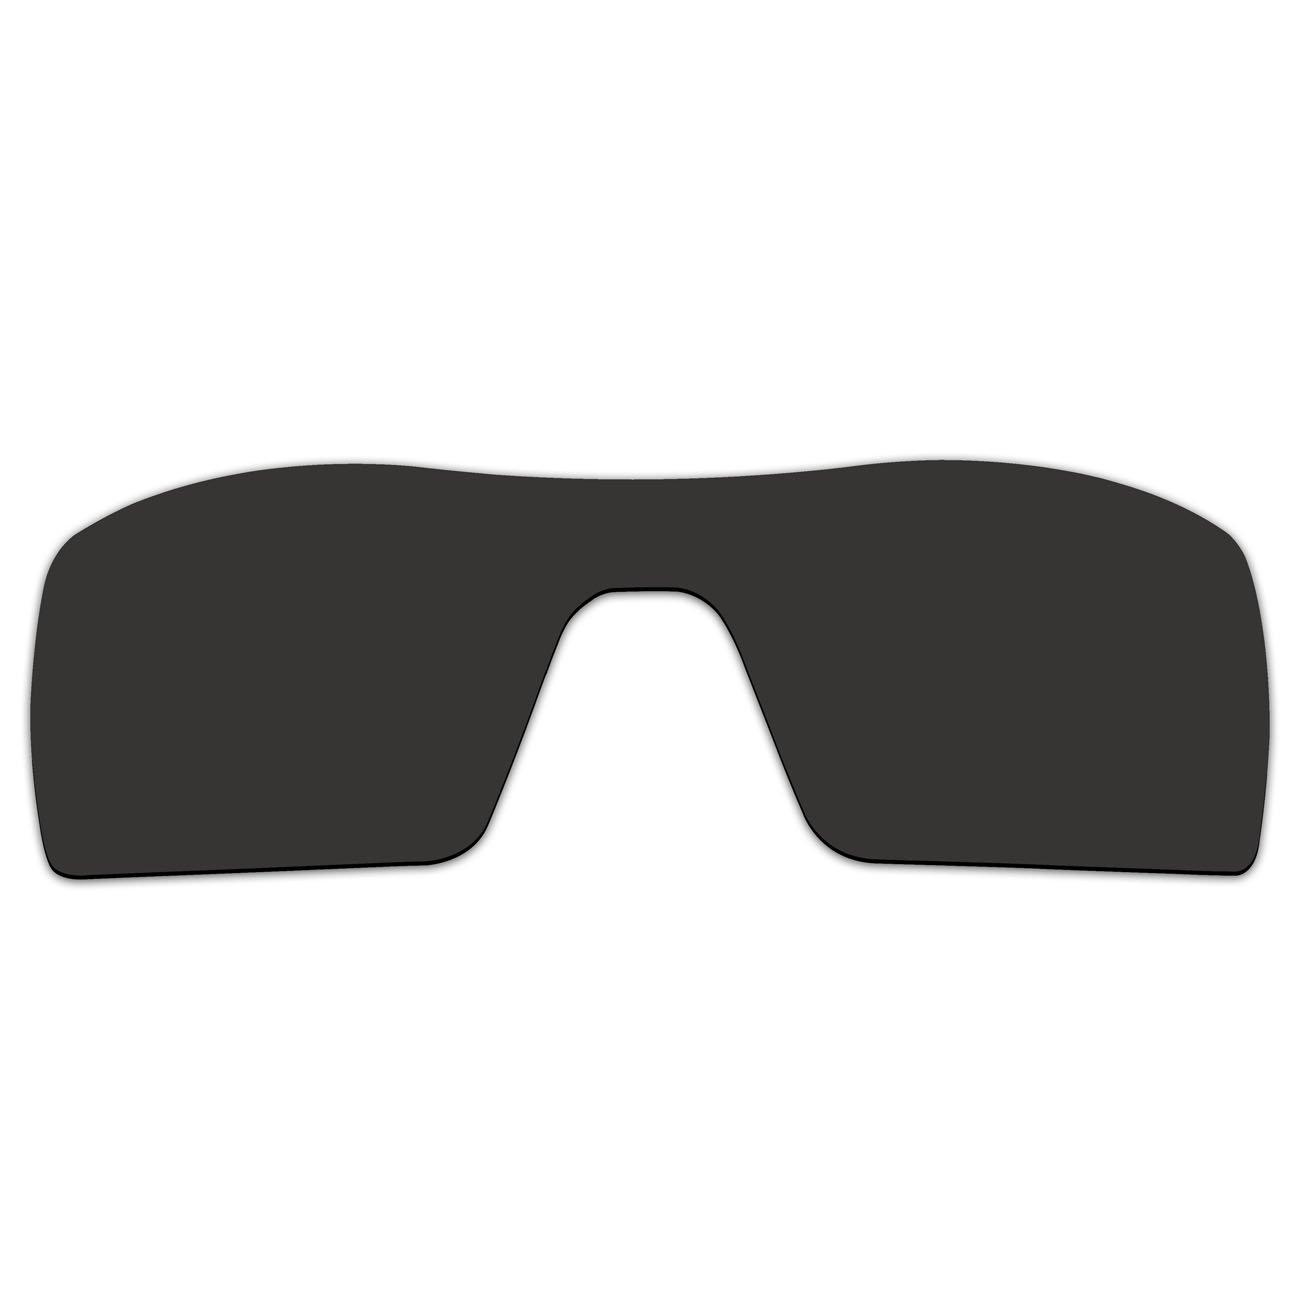 48267b47f6 Amazon.com   ACOMPATIBLE Replacement Lenses Oakley Oil Rig II Sunglasses Gen  2 (Black - Polarized)   Sports   Outdoors